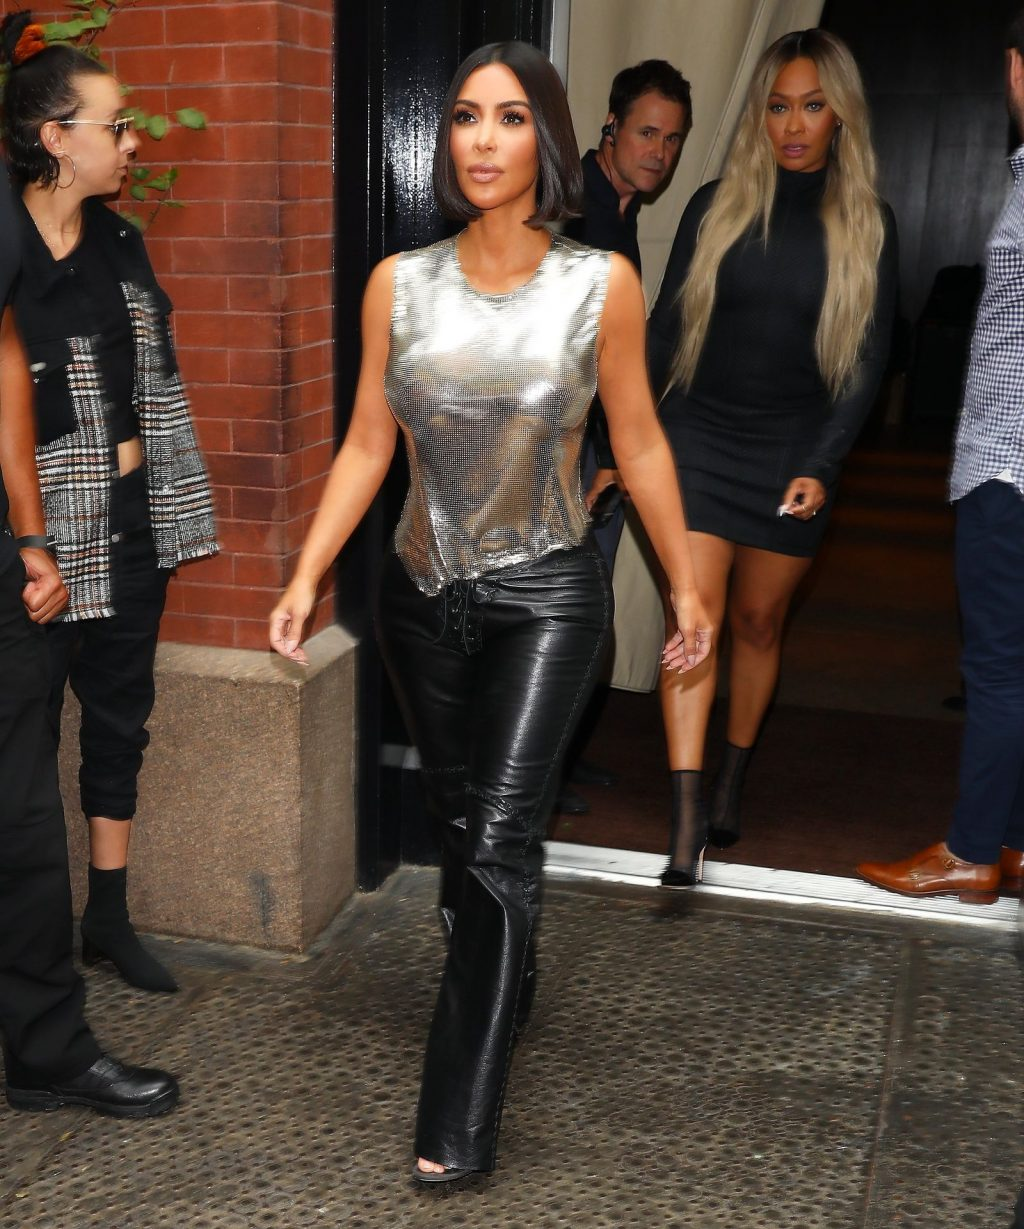 Uncategorized 2019 : Kim Kardashian arrives at a fashion show in New York during New York Fashion Week 2019-49